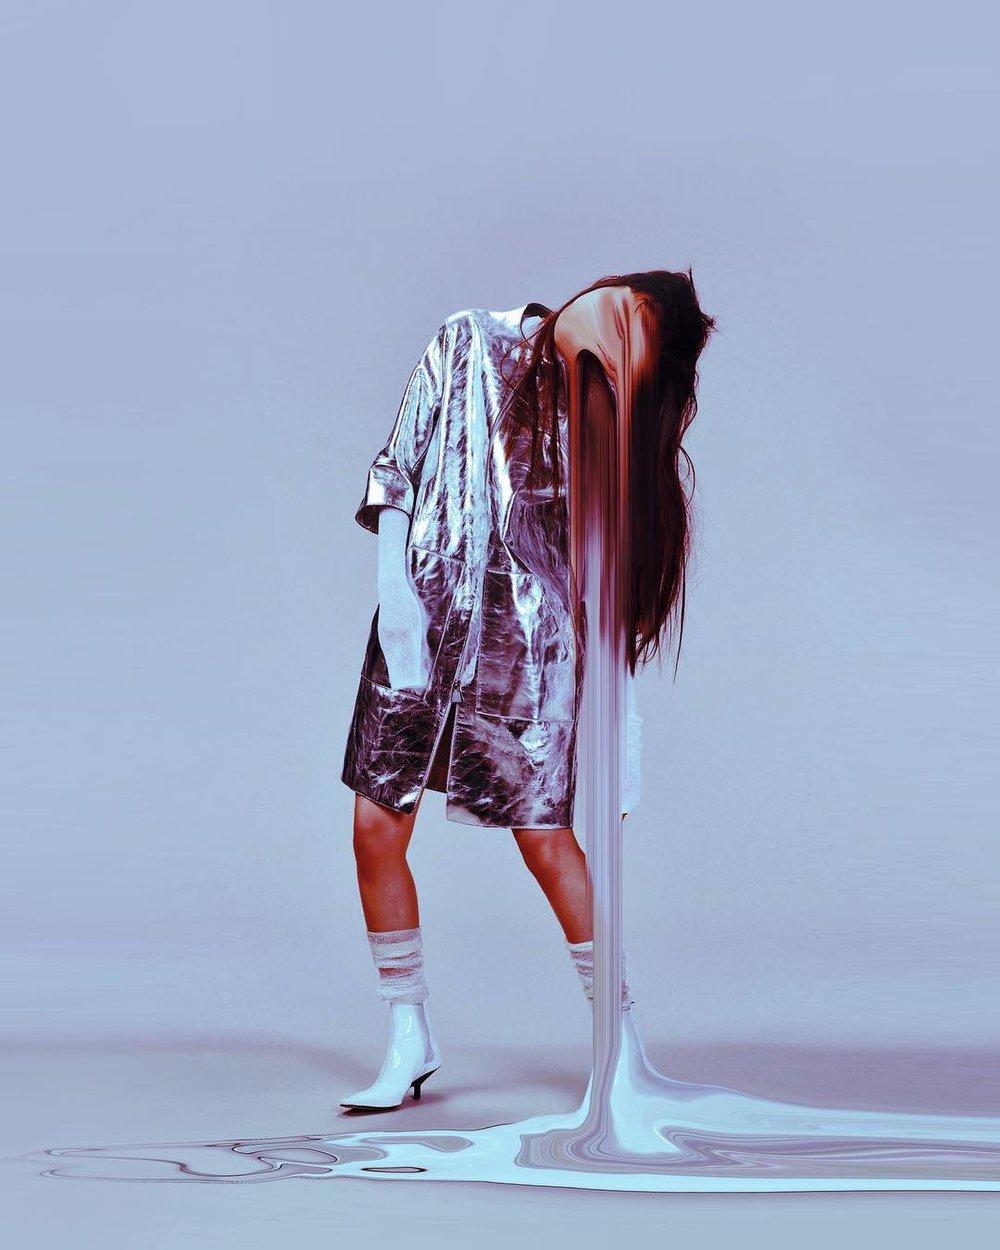 Slimesunday-Interview-Visual Atelier 8-Art-25.jpg